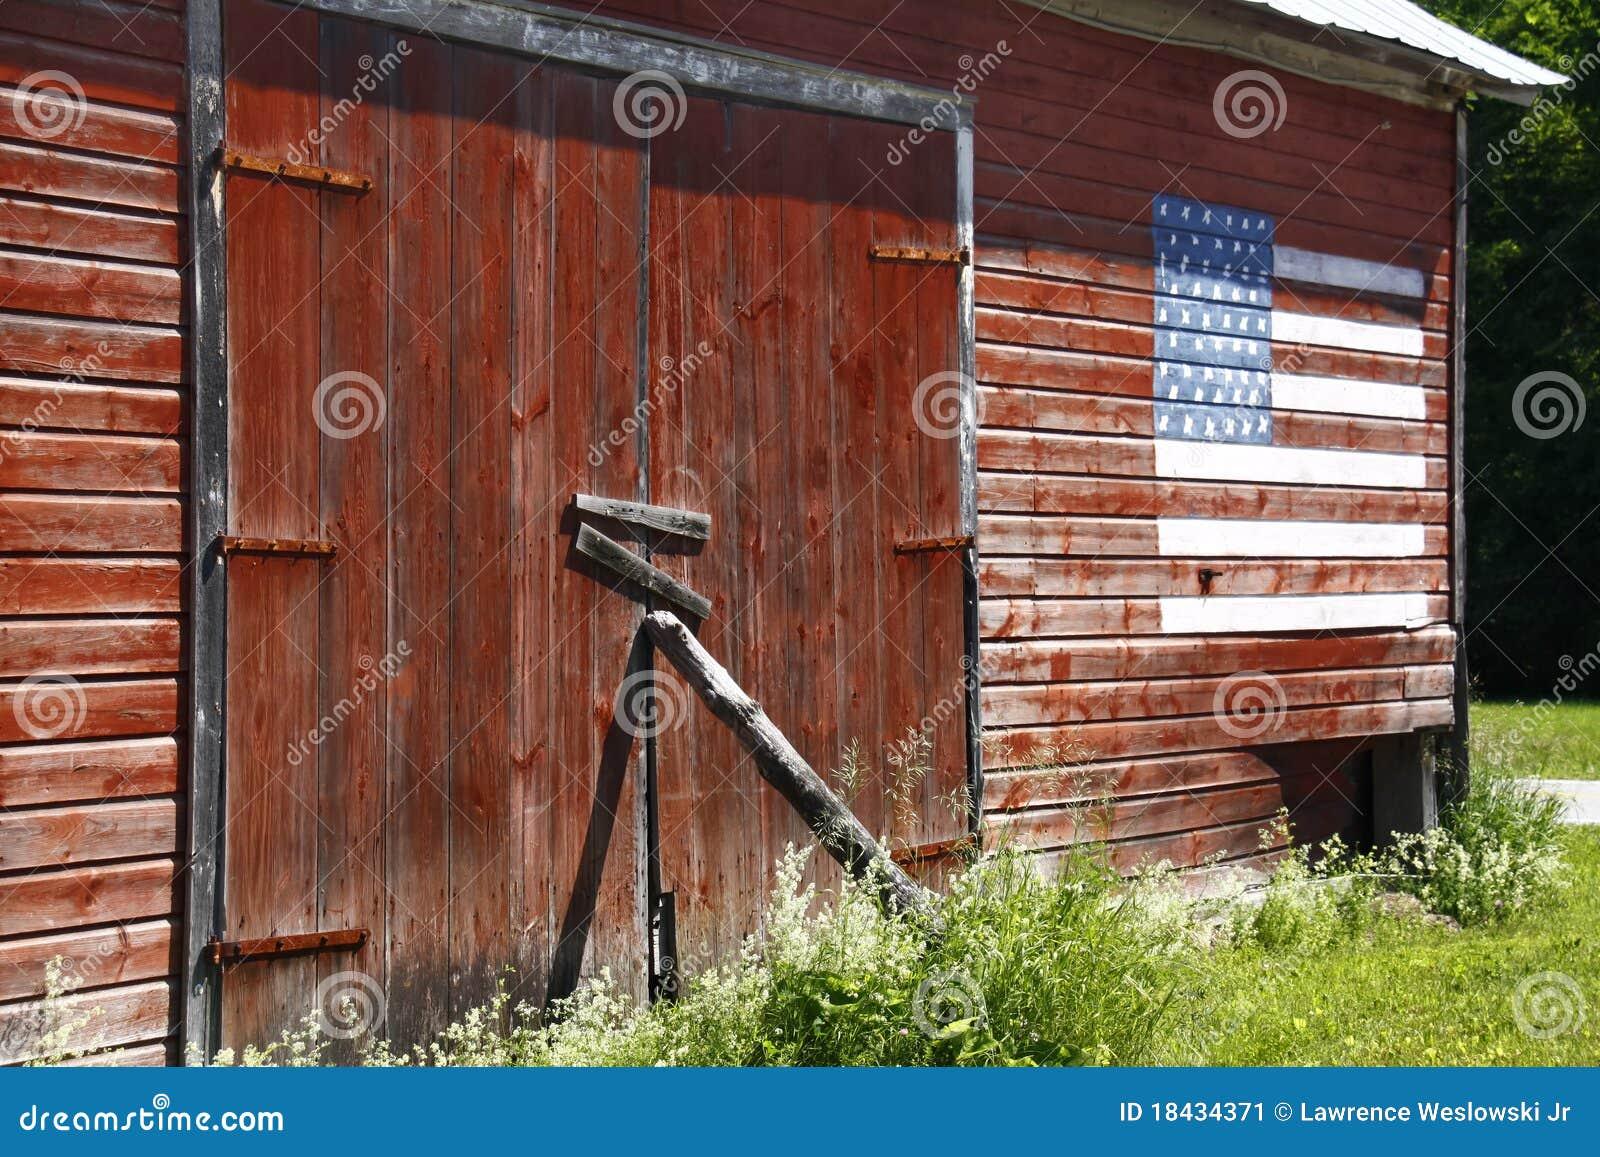 Red Barn, American Flag